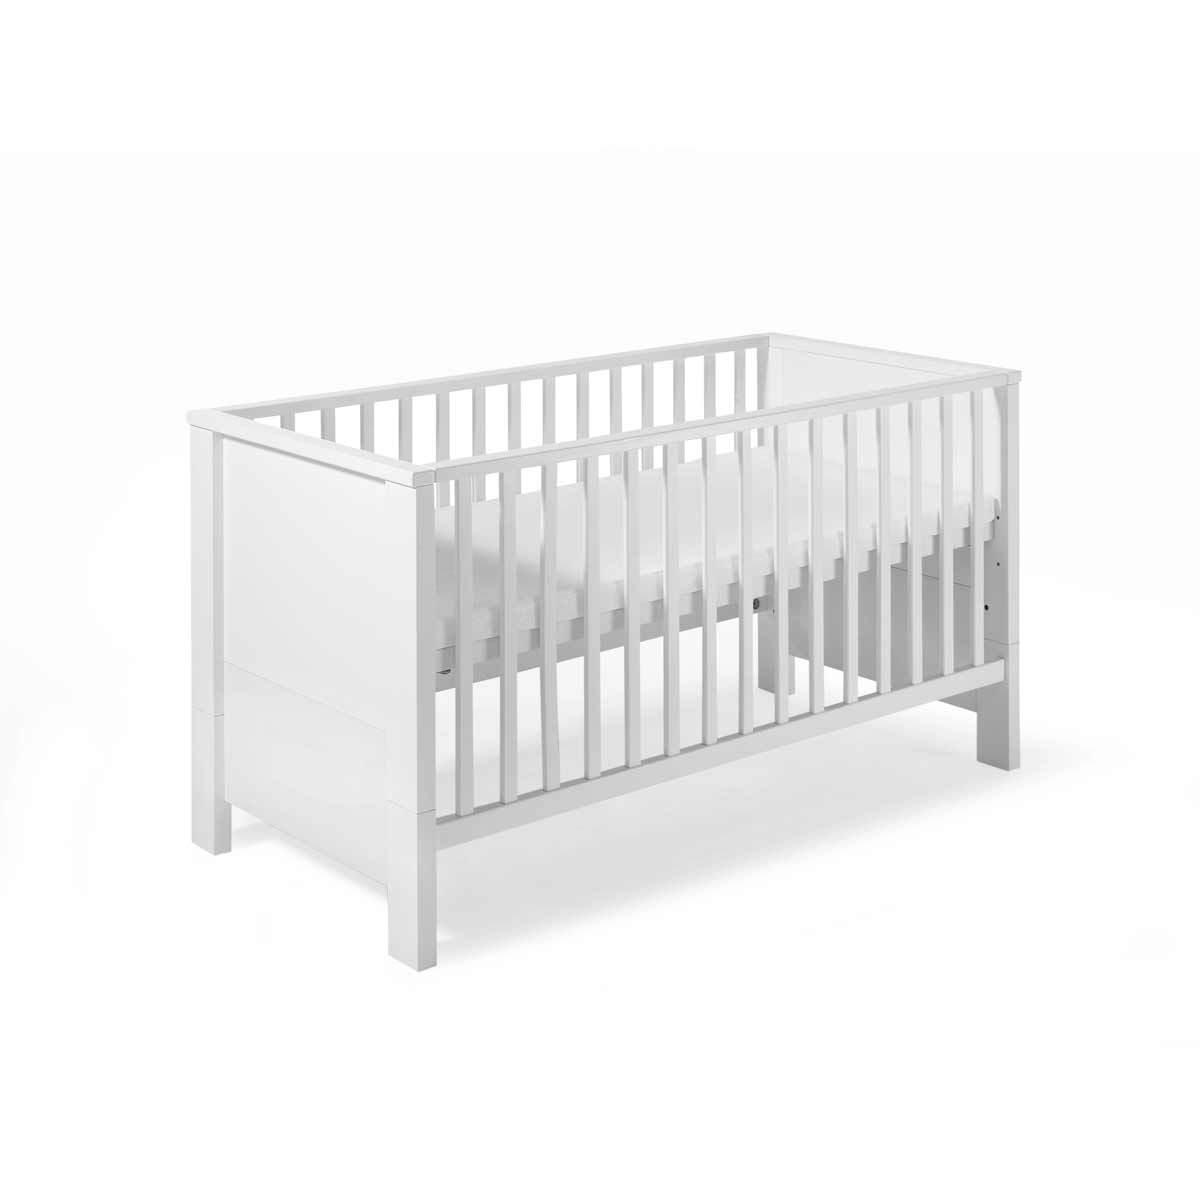 Lit b b 70 x 140 cm volutif milano blanc 046460202 - Lit enfant ajustable ...